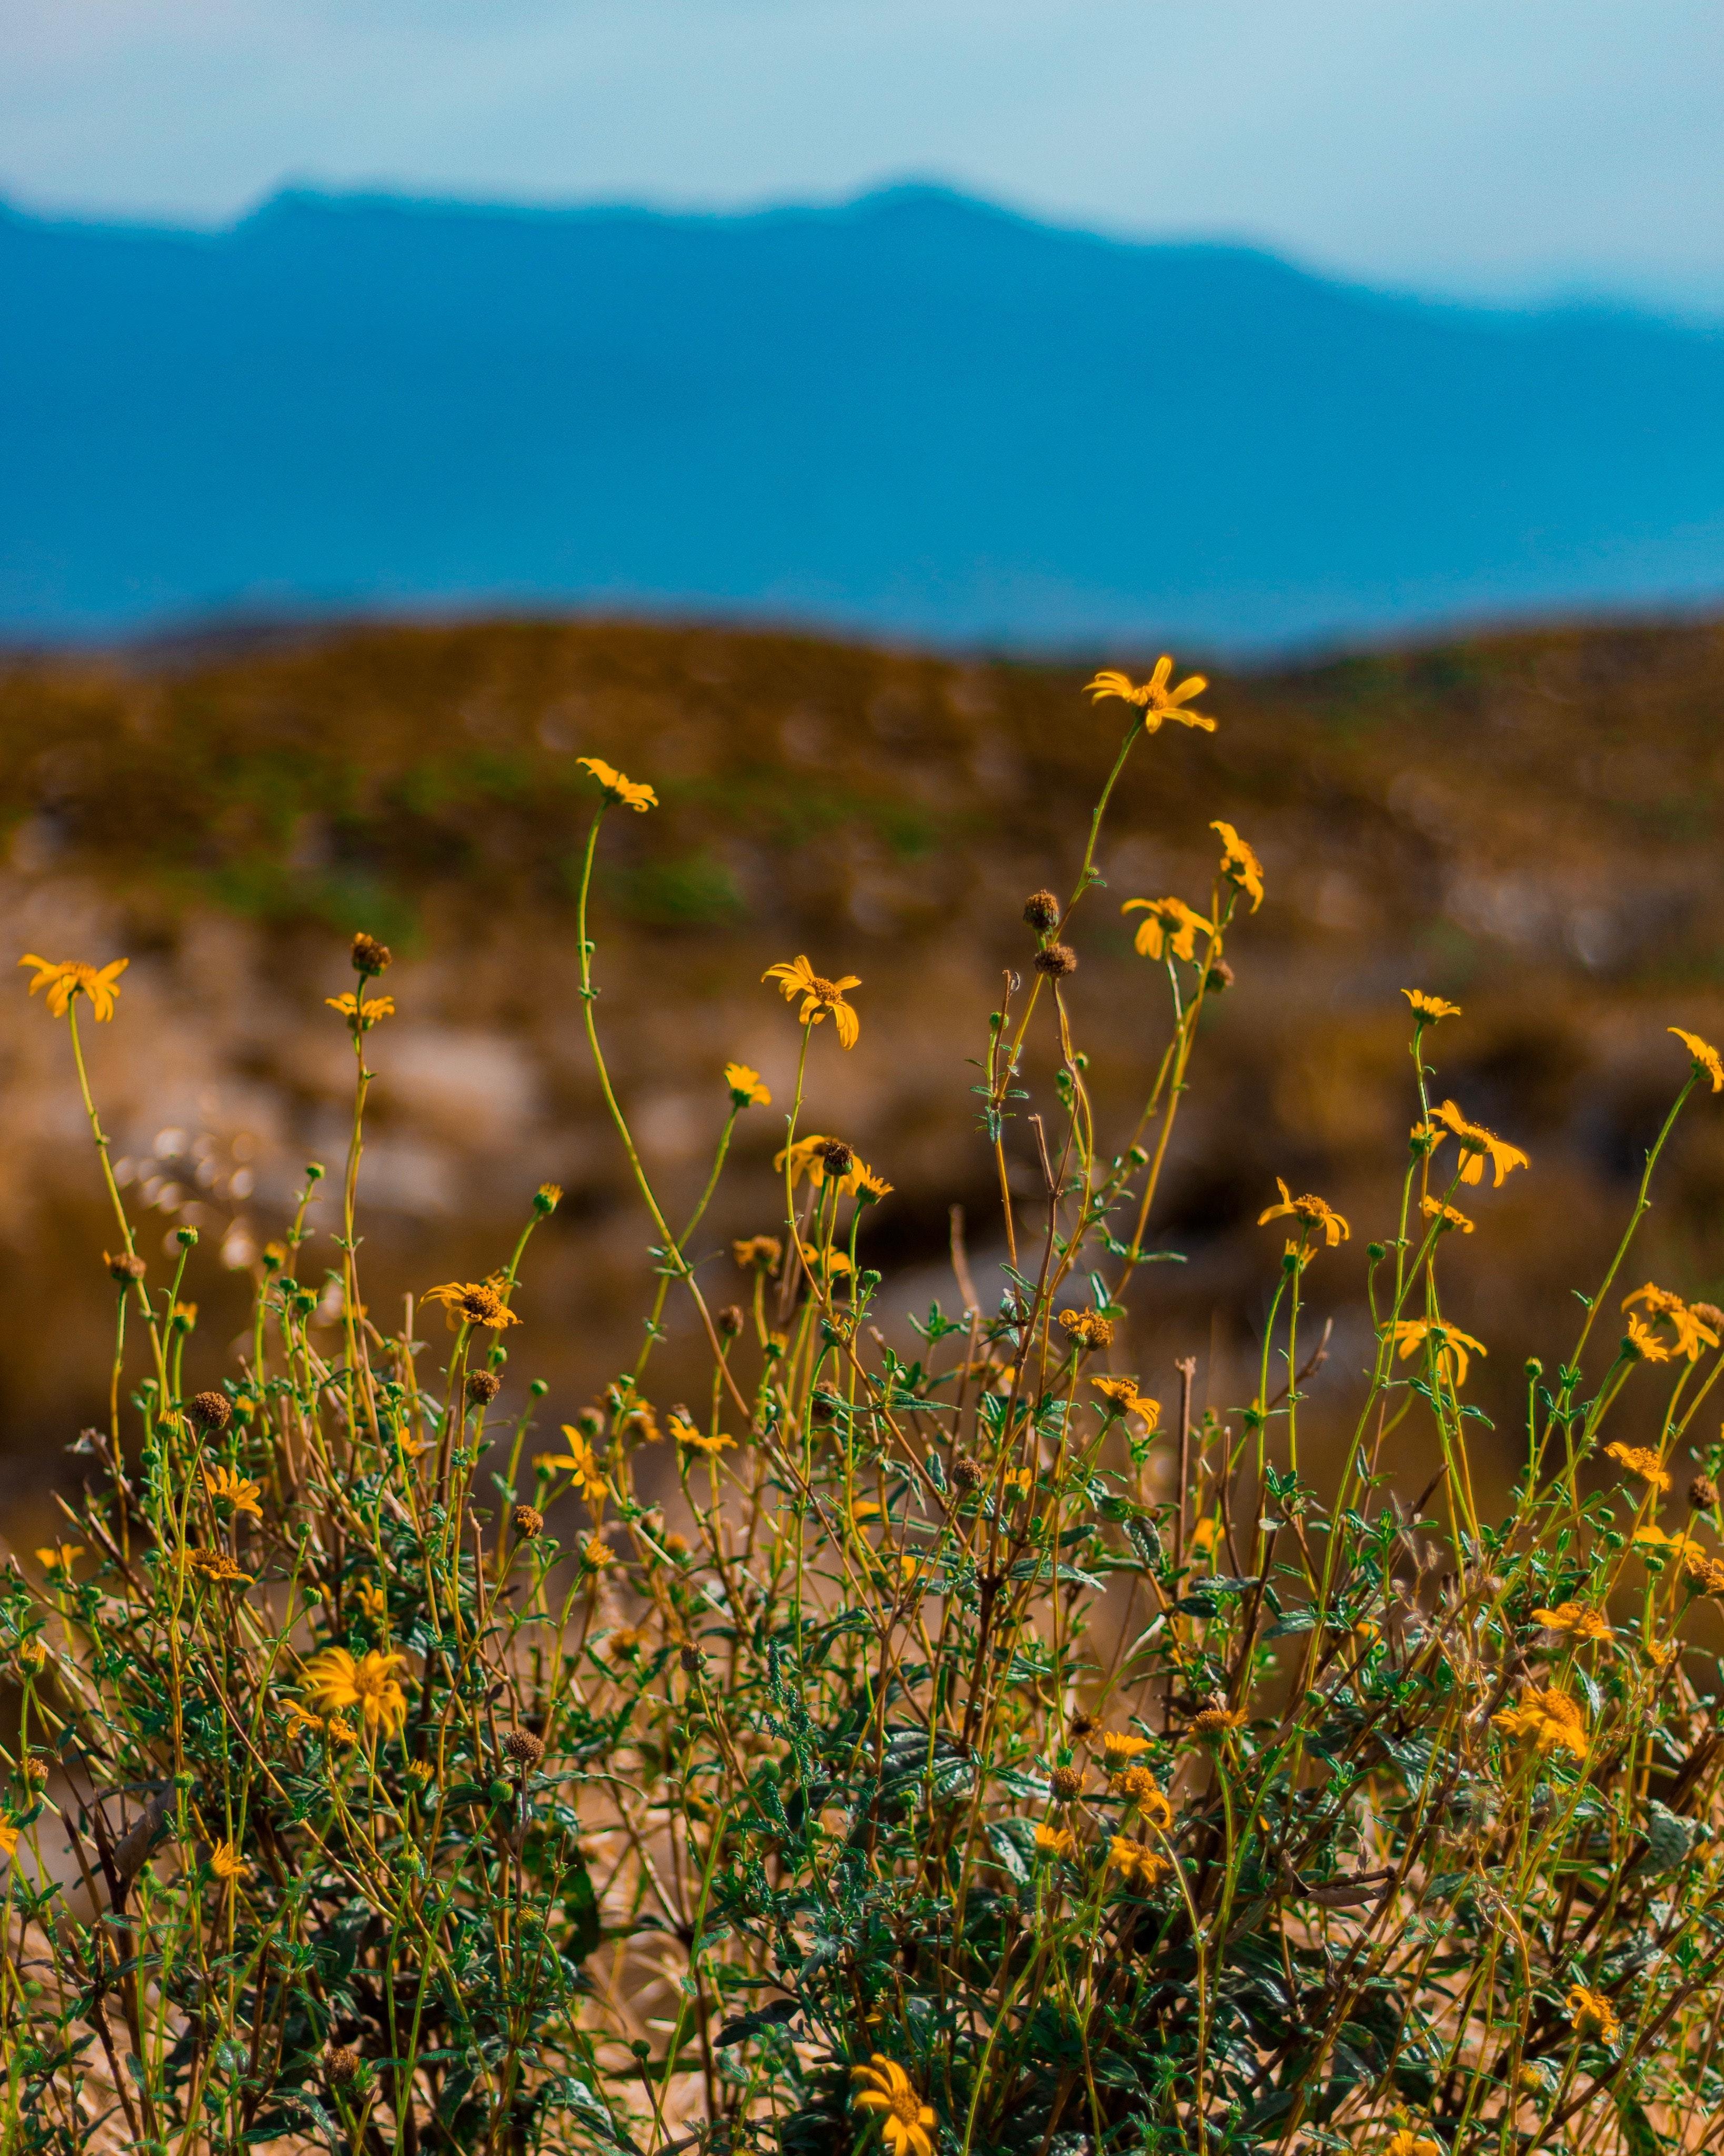 Yellow Petaled Flowers, Beautiful, Meadow, Wild, Sunset, HQ Photo